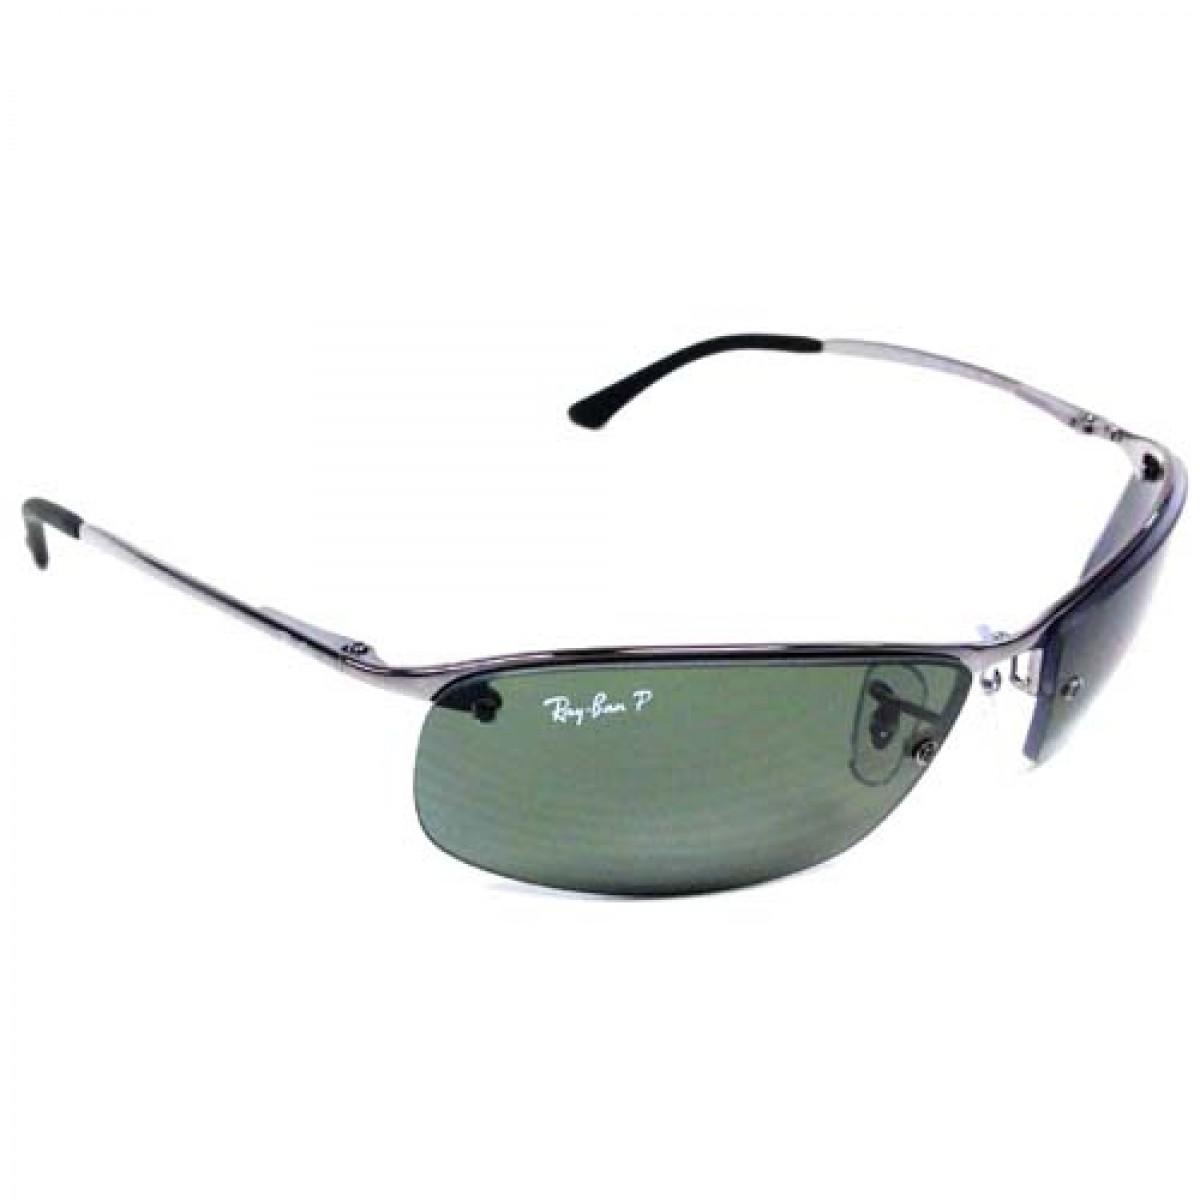 1c74bde2cc Ray Ban Polarized Gunmetal Men Sunglasses RB3183-004 9A-63 - Fashion ...